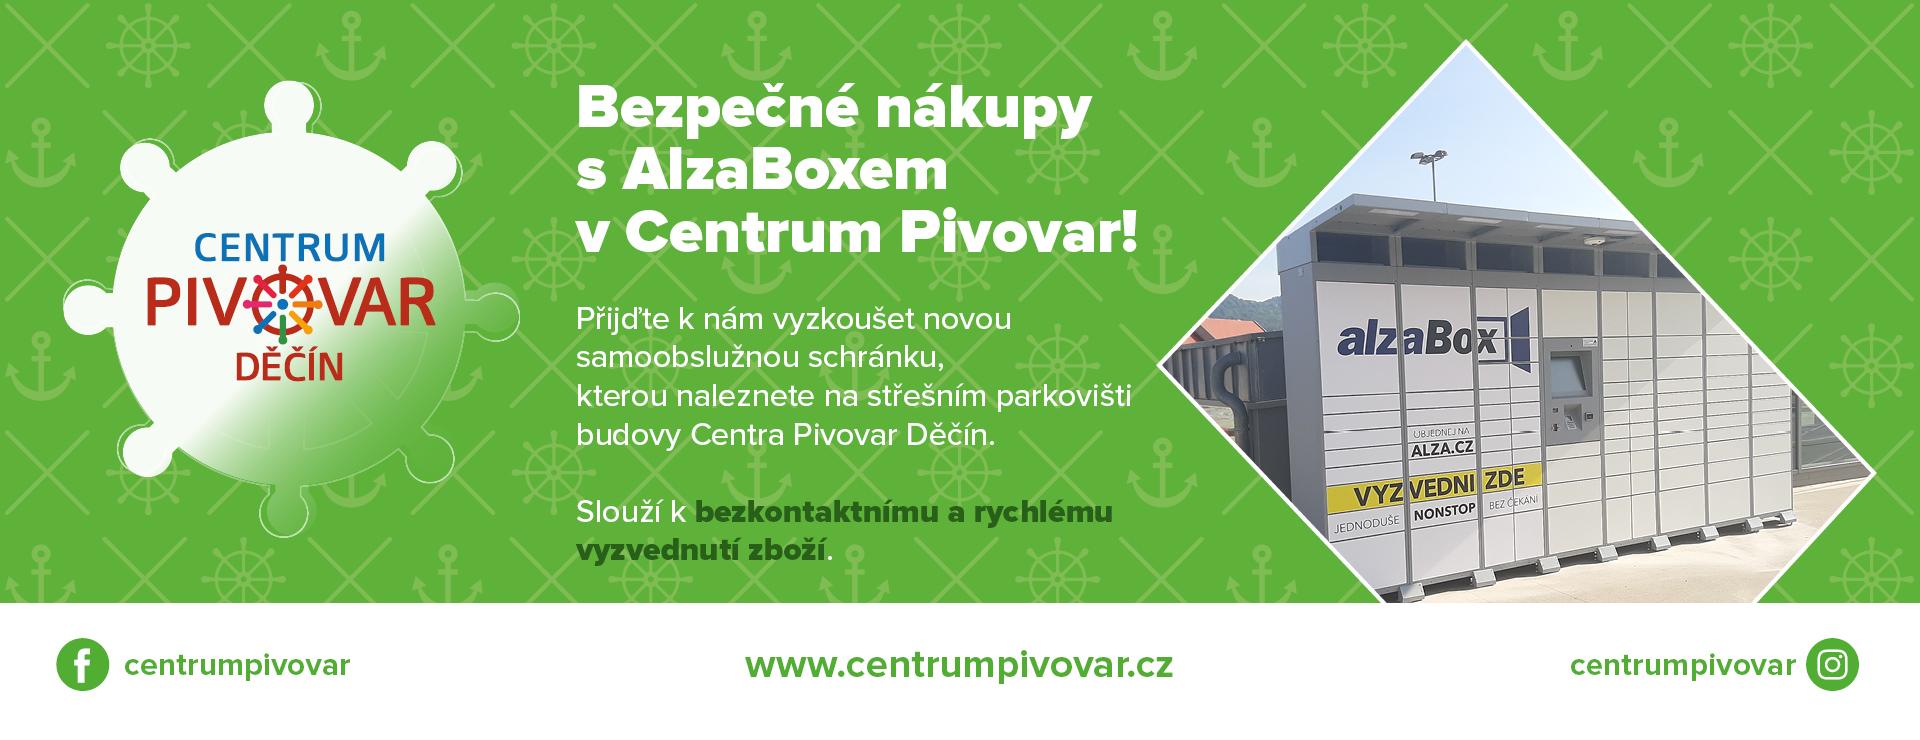 ocp-banner-alza-box-1920x740px.jpg